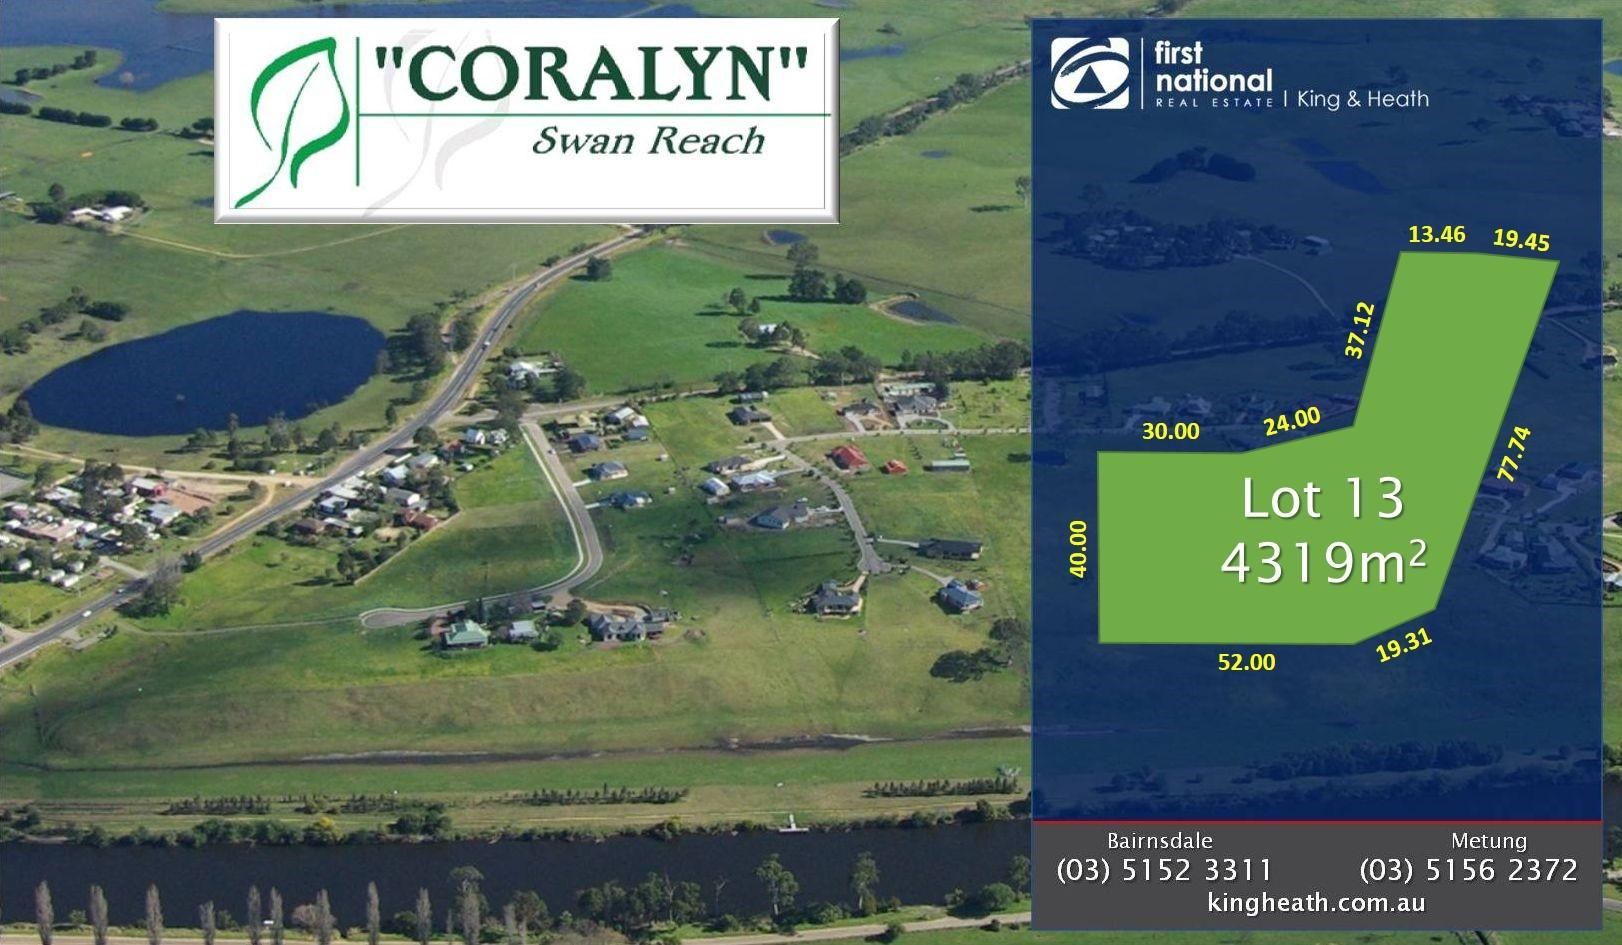 Lot 13 Coralyn Drive, Swan Reach VIC 3903-1